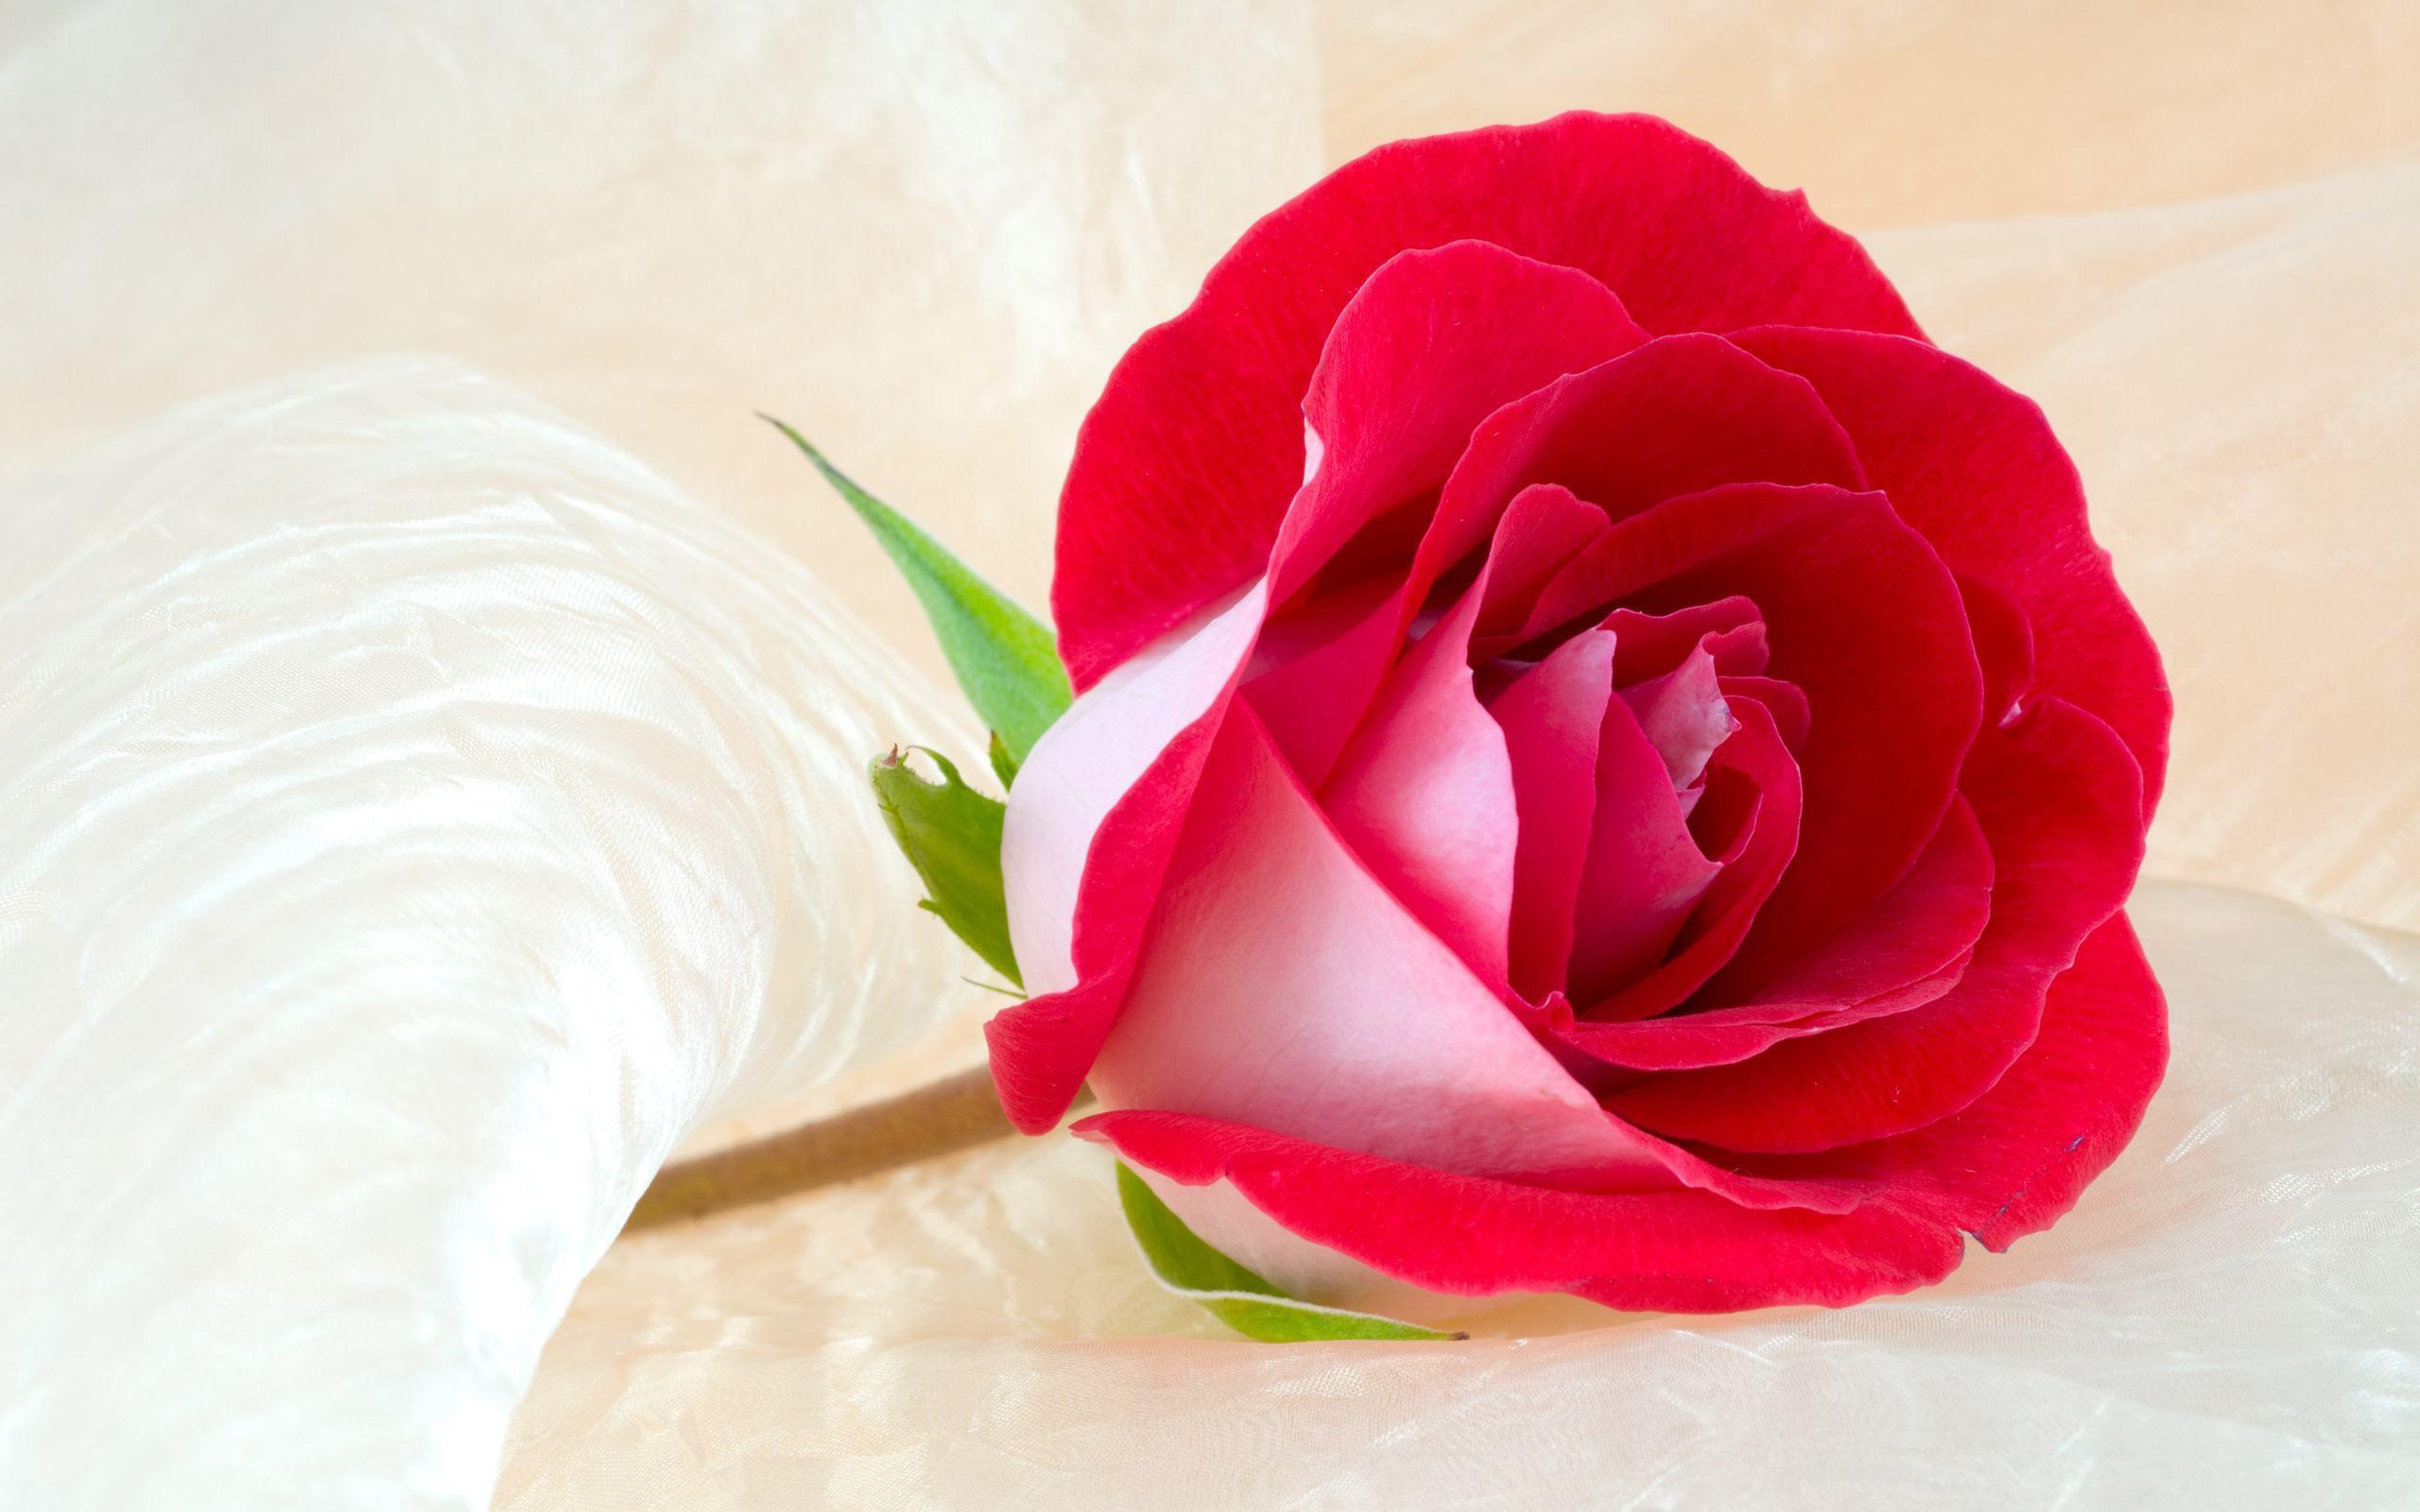 Rose Wallpaper Free Download | Wide Wallpapers